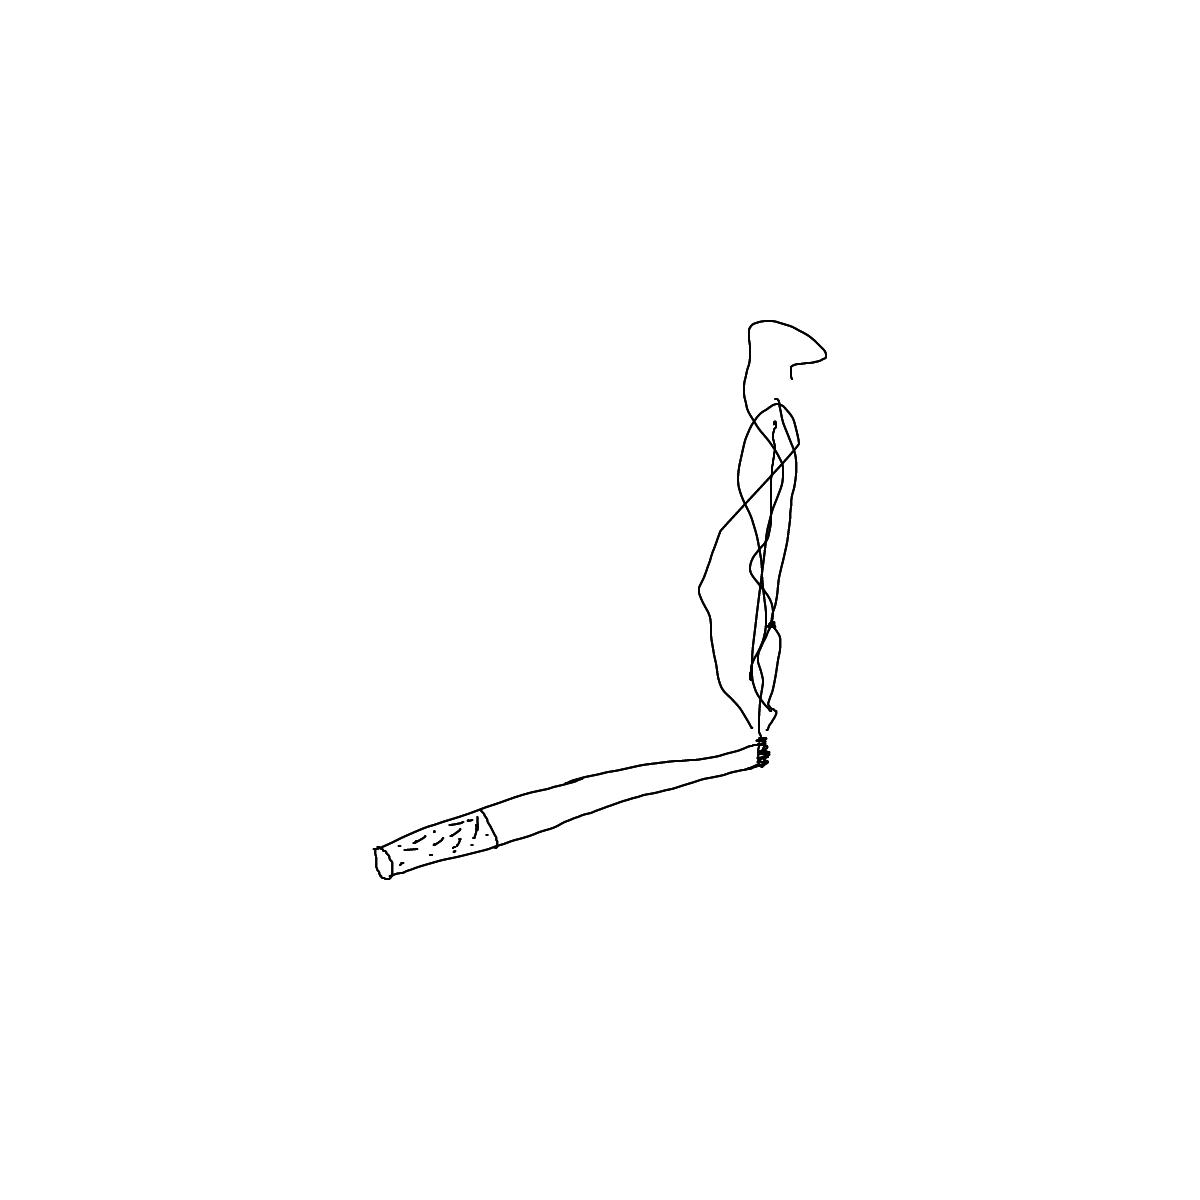 BAAAM drawing#53 lat:52.4857711791992200lng: 13.4190979003906250